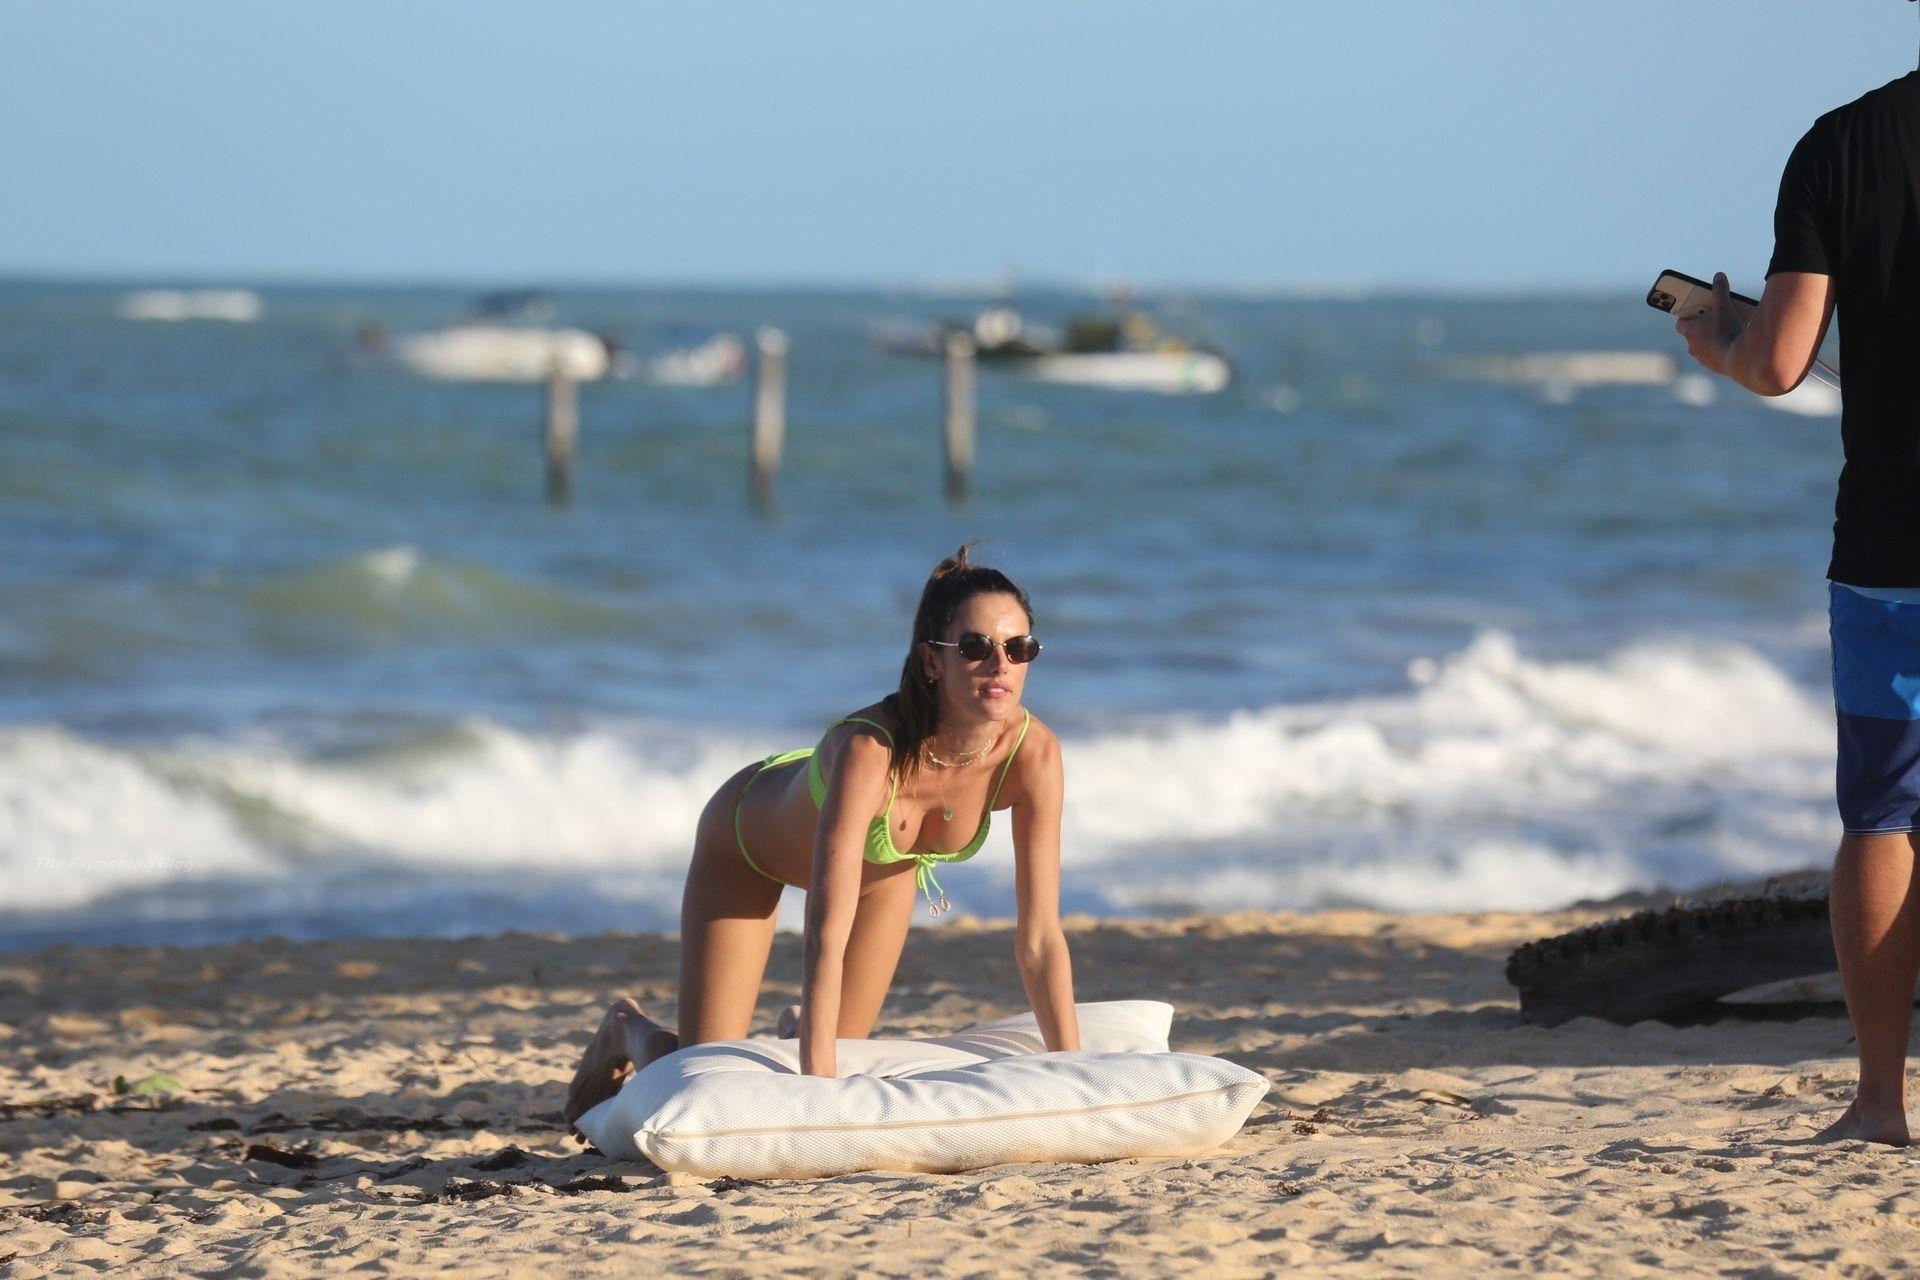 Alessandra-Ambrosio-Sexy-The-Fappening-Blog-461.jpg